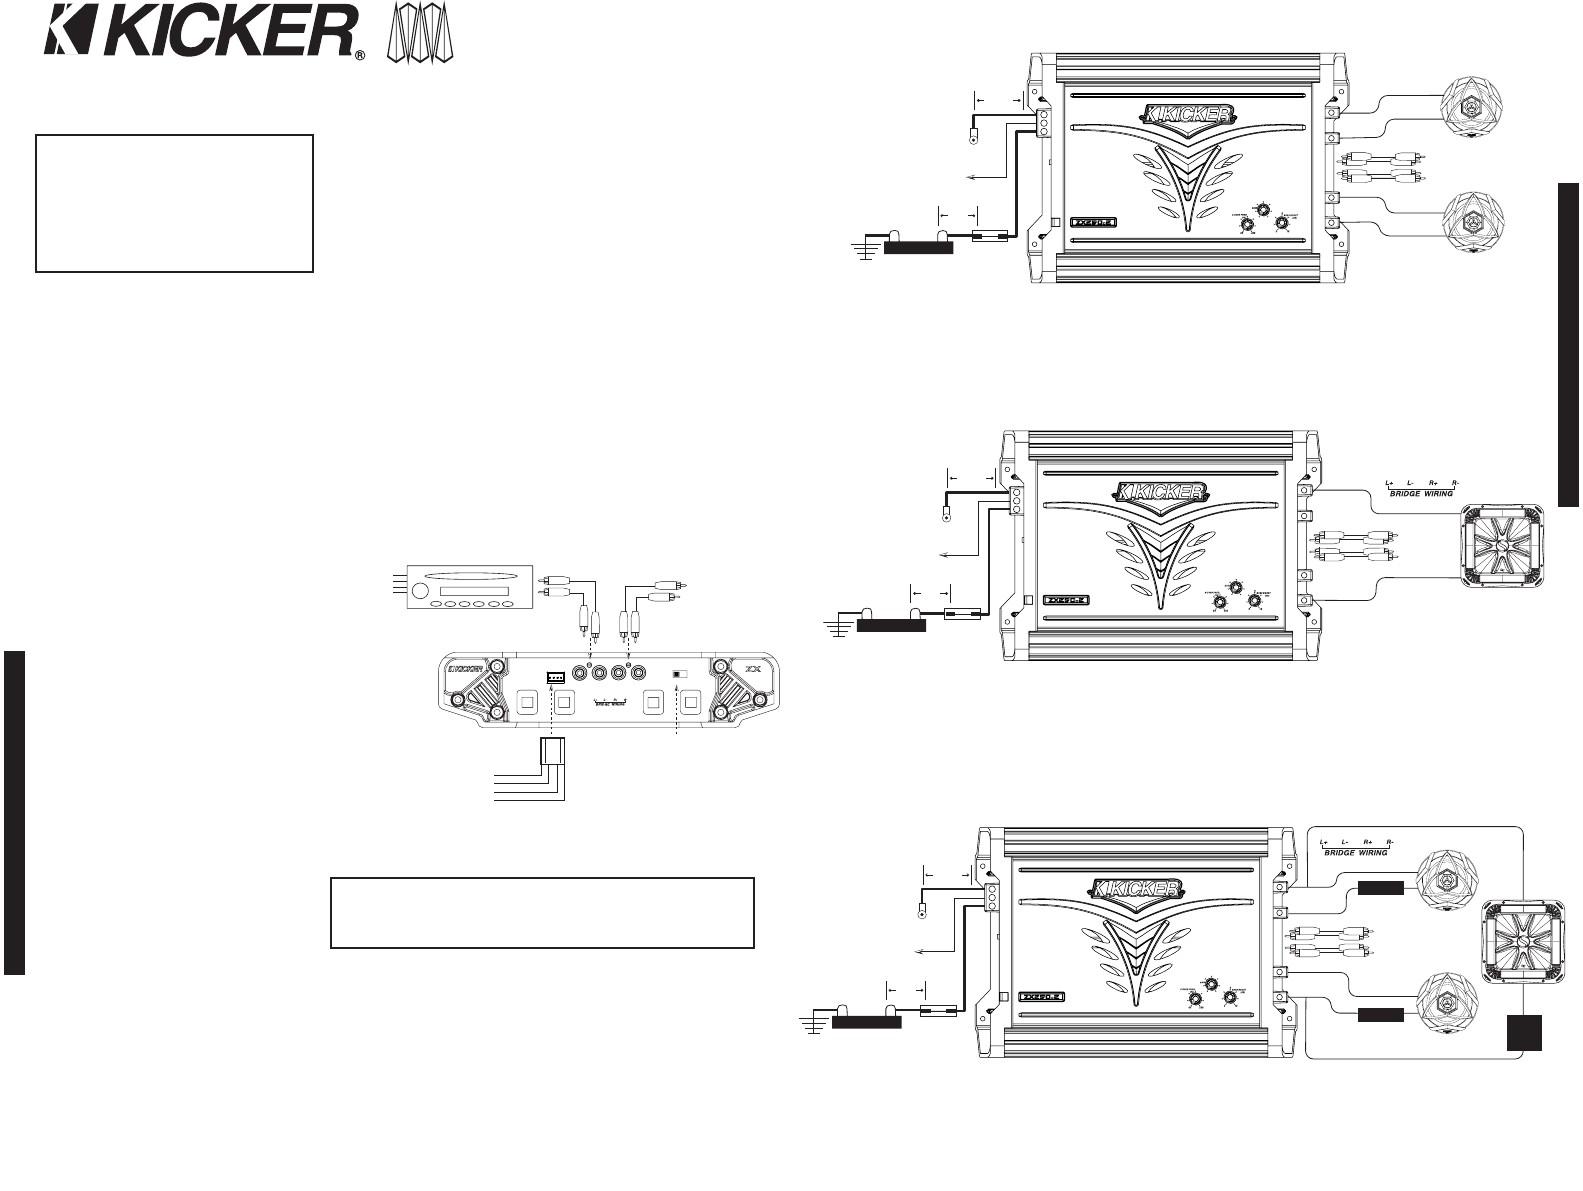 Kicker Solo Baric L7 Wiring Diagram New